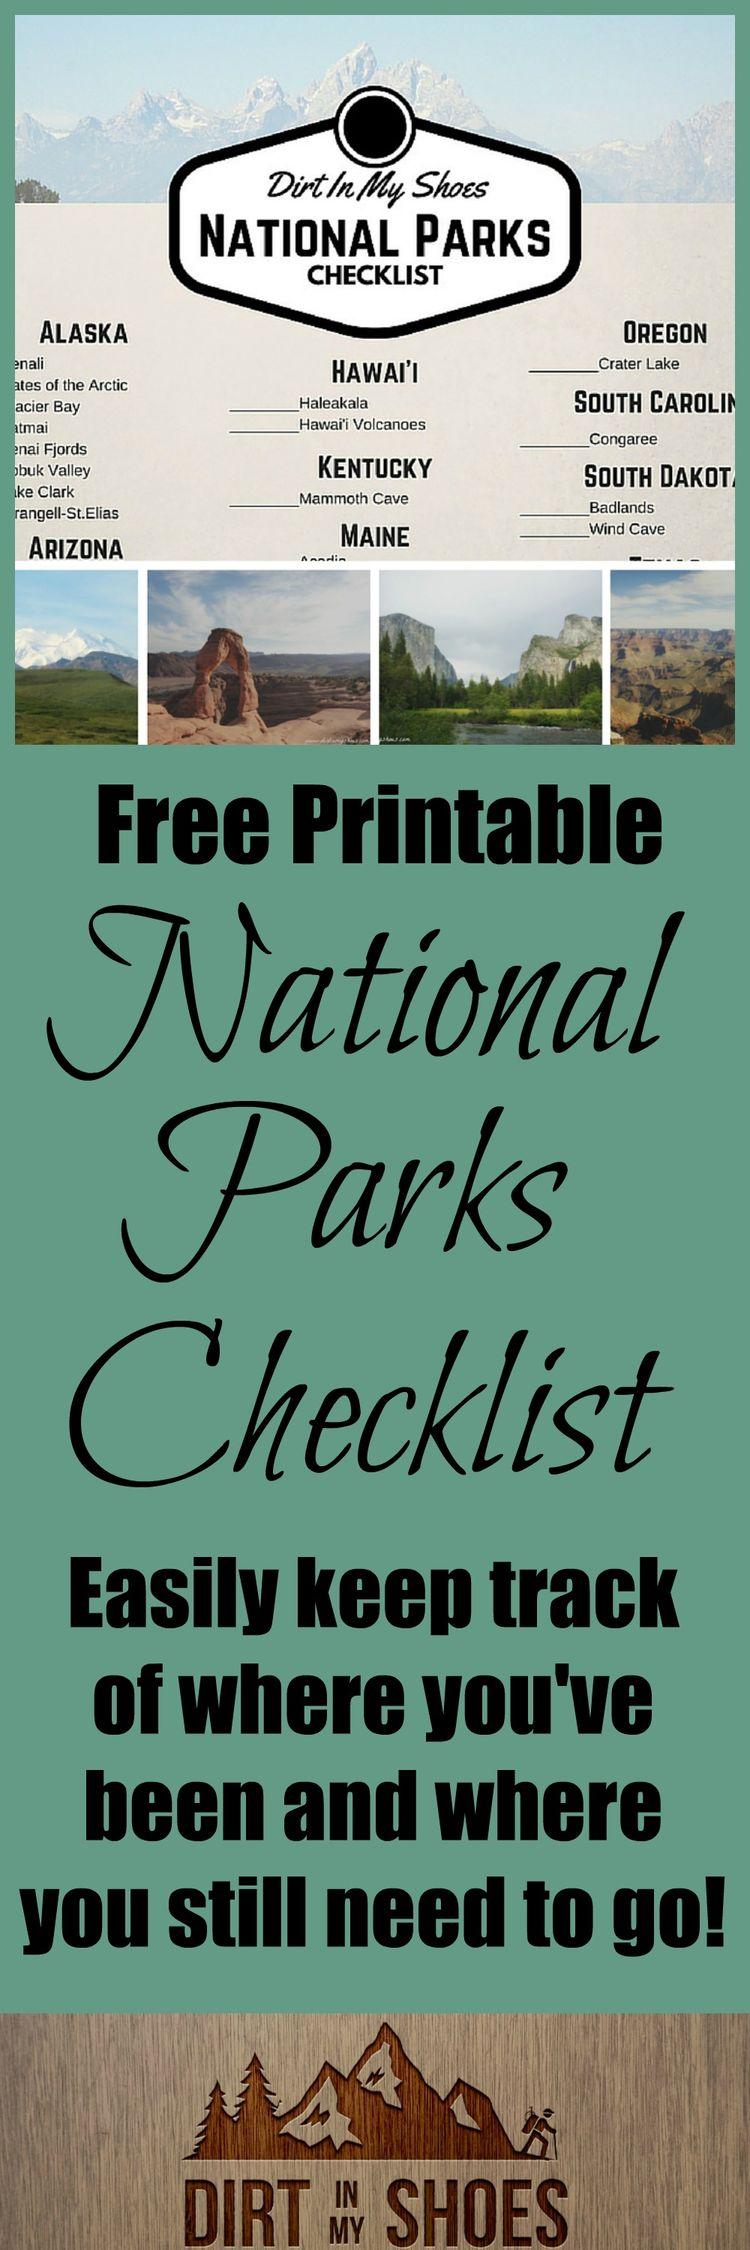 FREE National Parks Checklist!